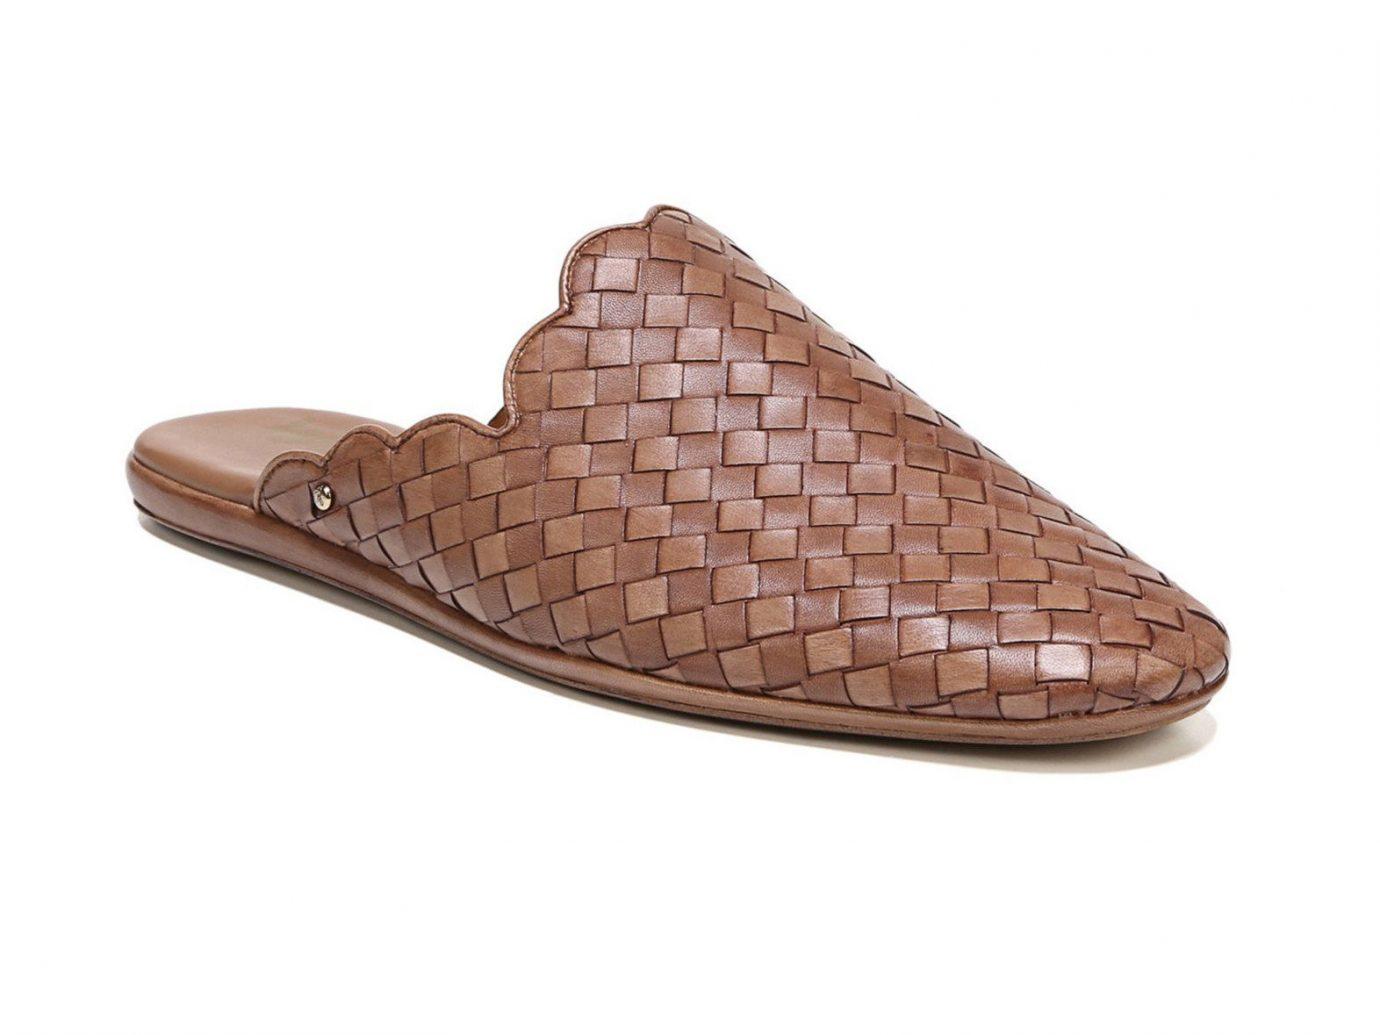 Sam Edelman Katy Leather Mules